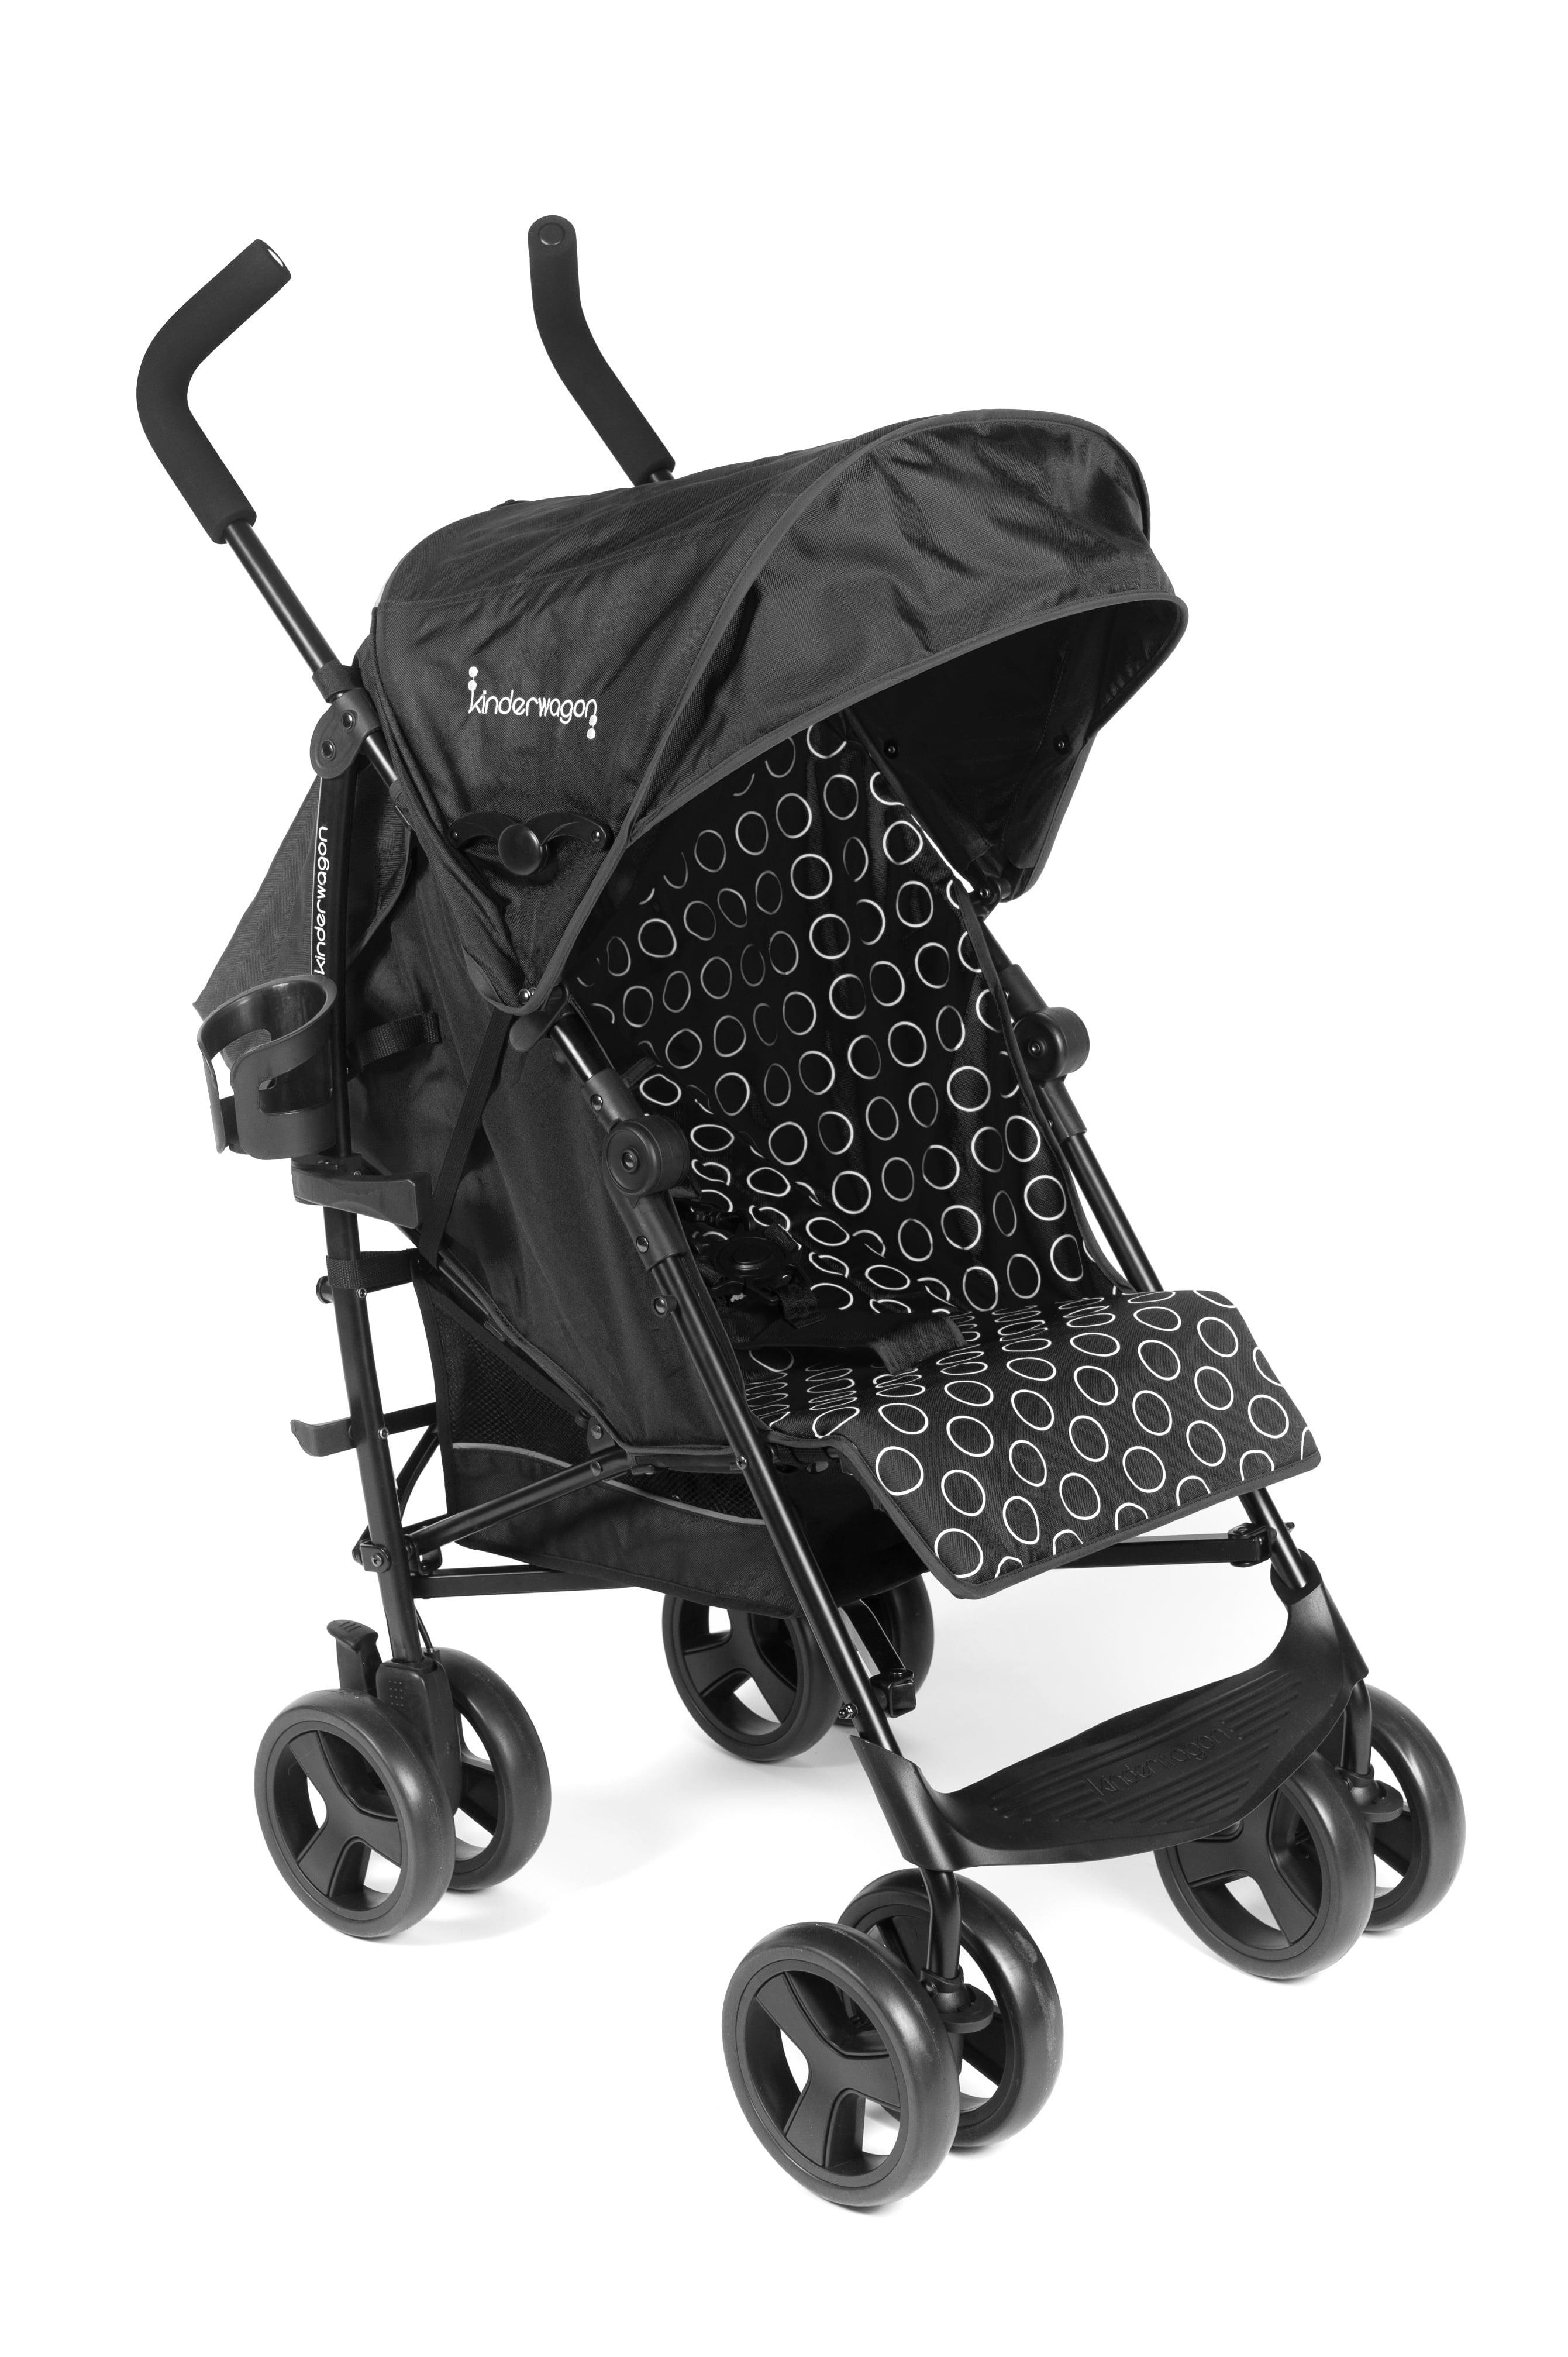 Kinderwagon Skip Lightweight Single Umbrella Stroller Black by Kinderwagon